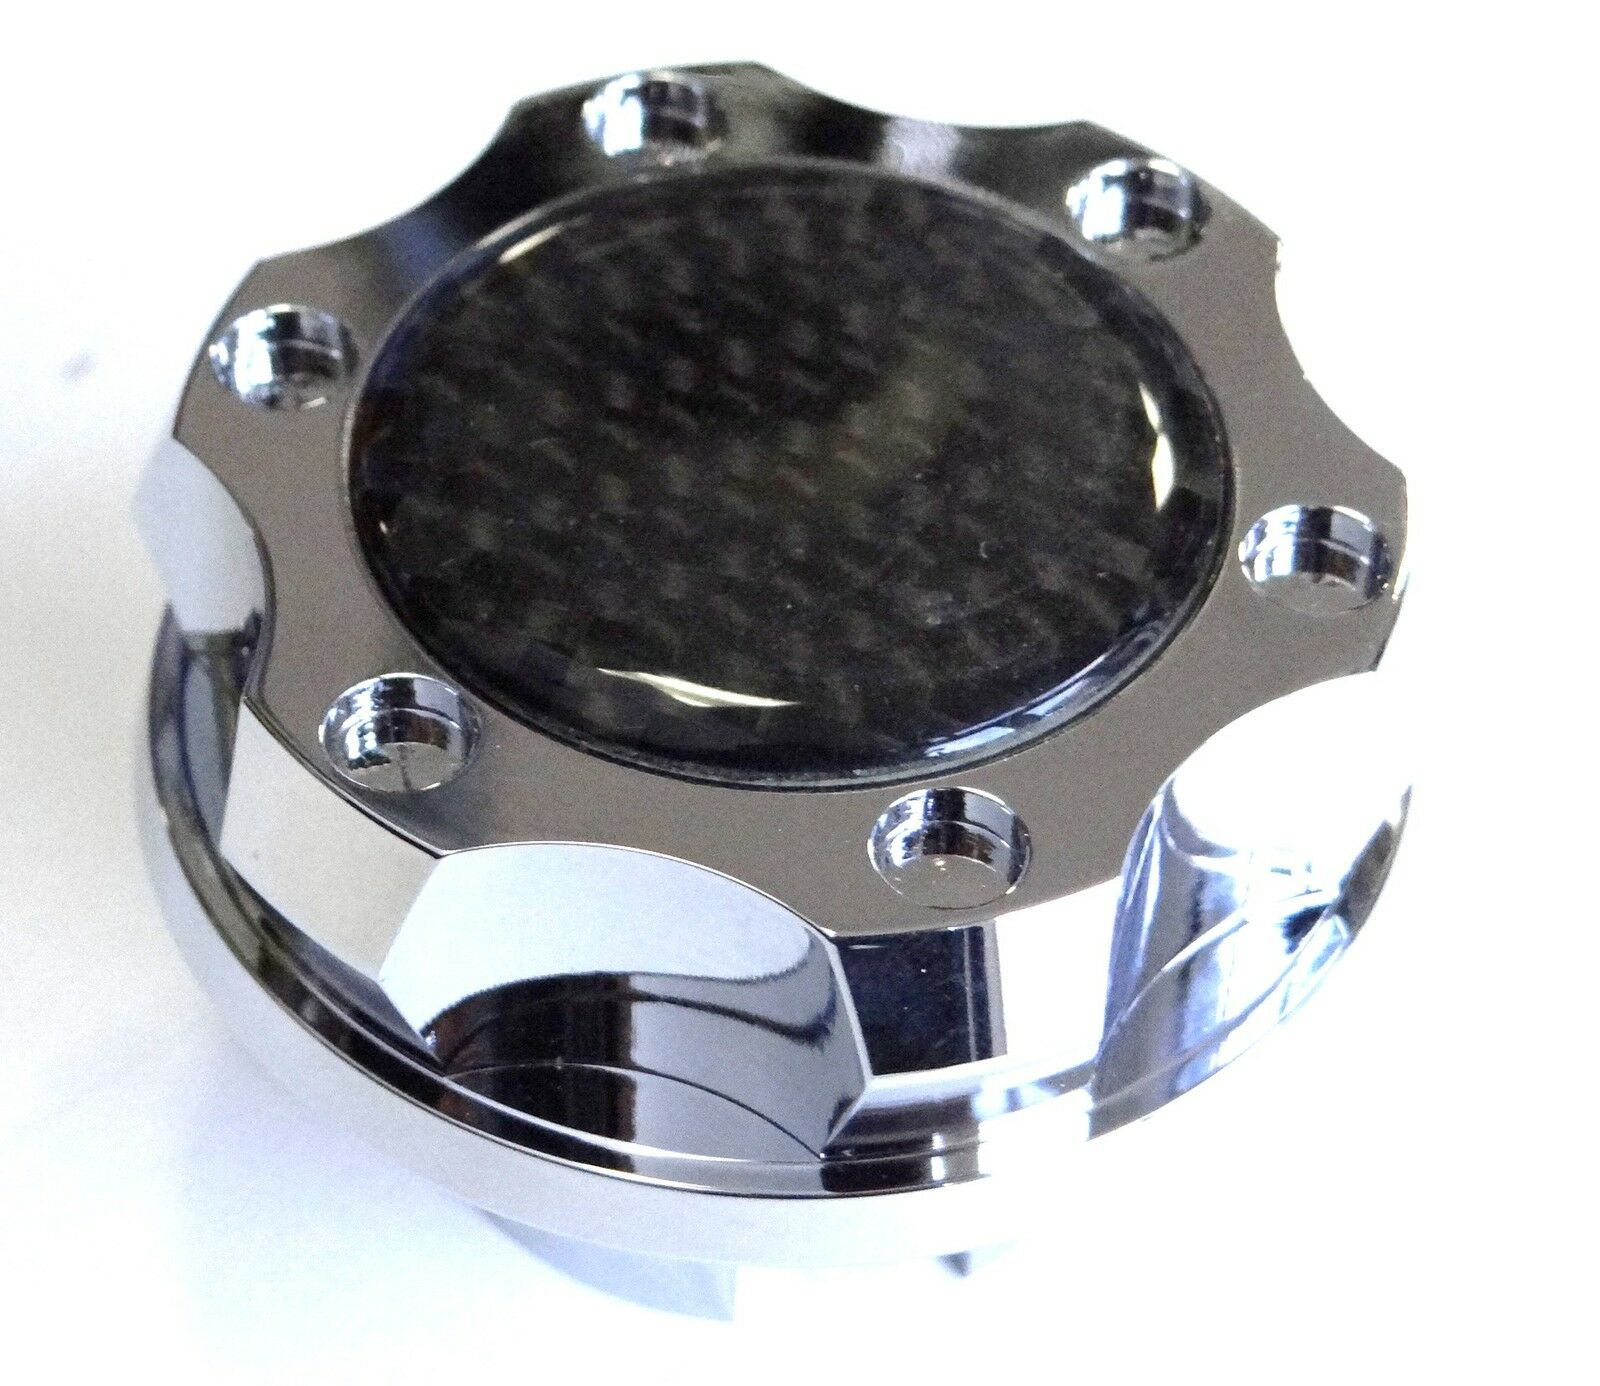 Ls6 Engine For Sale: VMS RACING BILLET ALUMINUM CHROME PLATED OIL CAP LS6